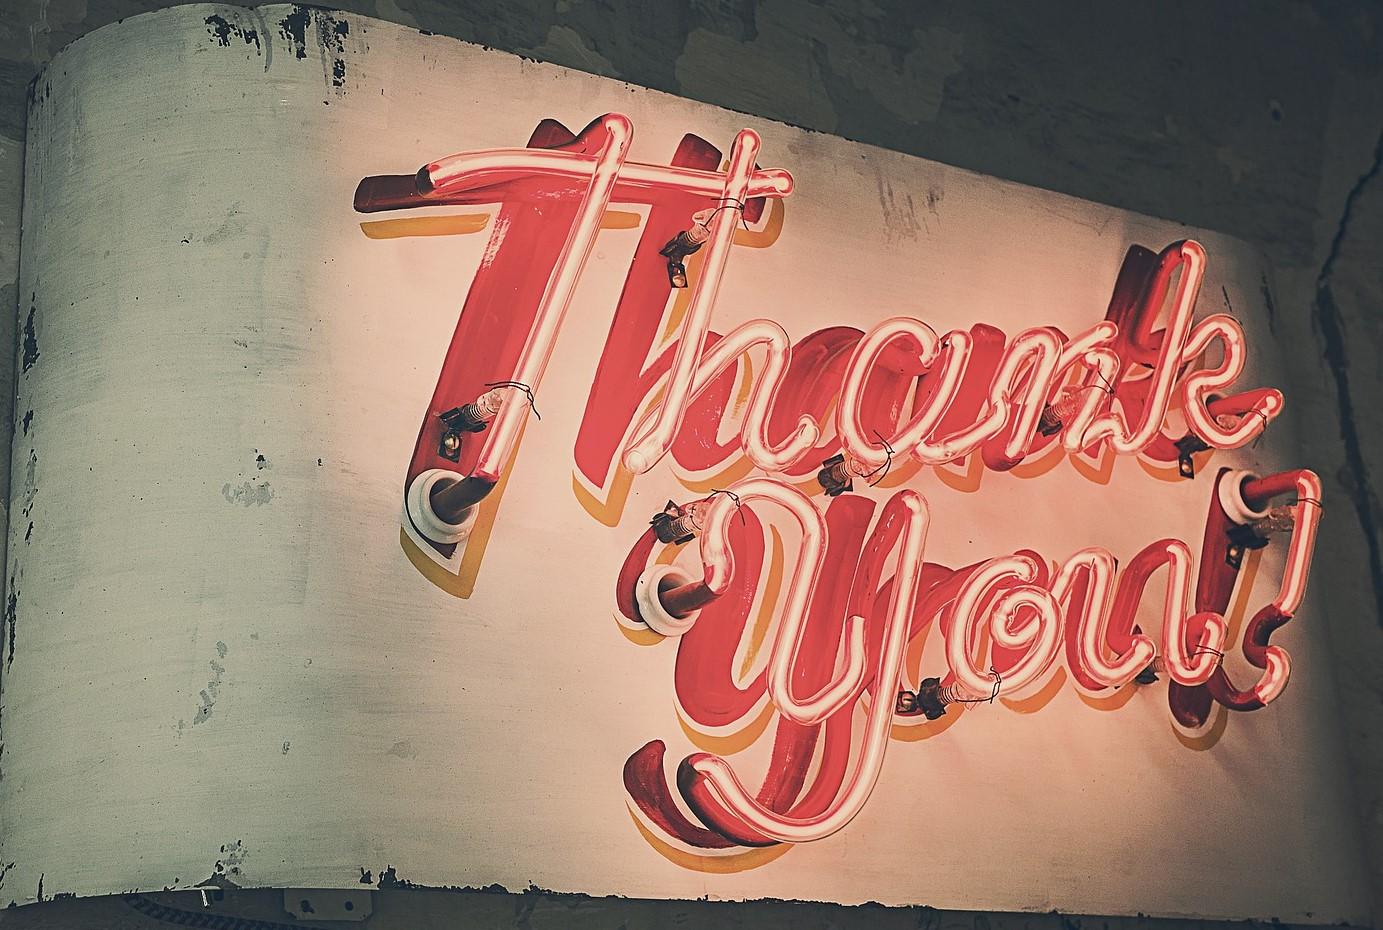 SkiMaquis wintersportdeluxe ontdekcorsica Merci thank you bedankpagina neonletters